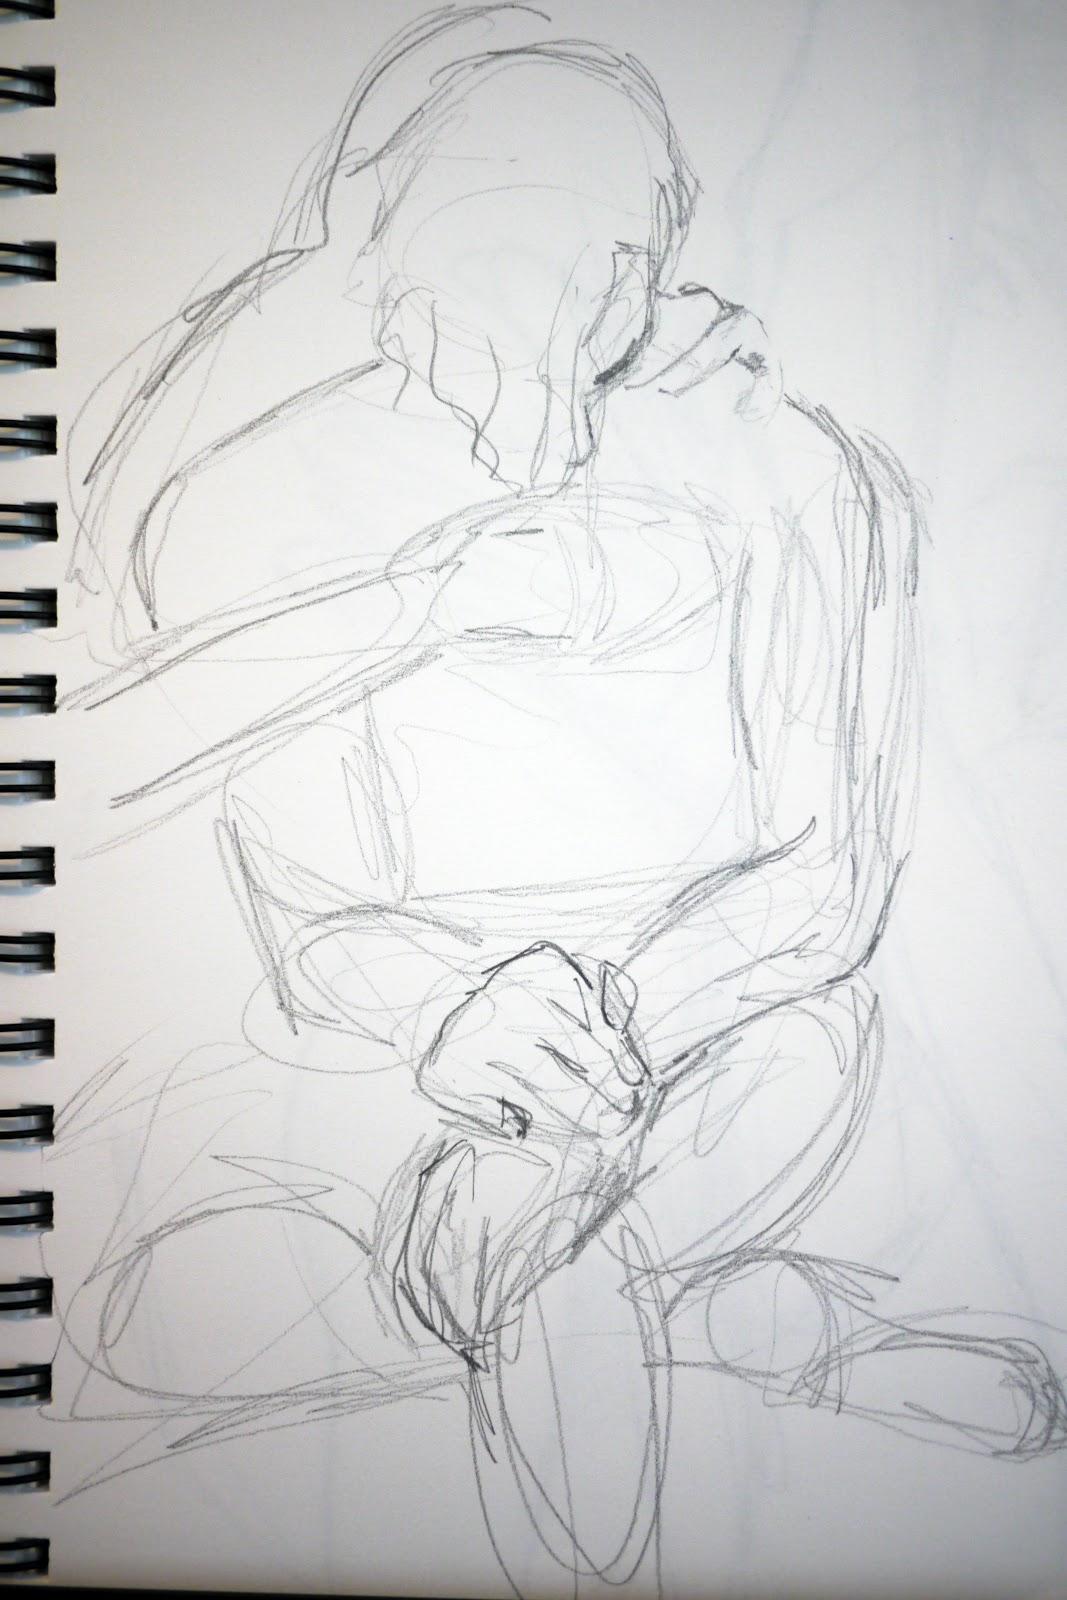 The Lovers: Life drawing session at Jankura | Koreabridge